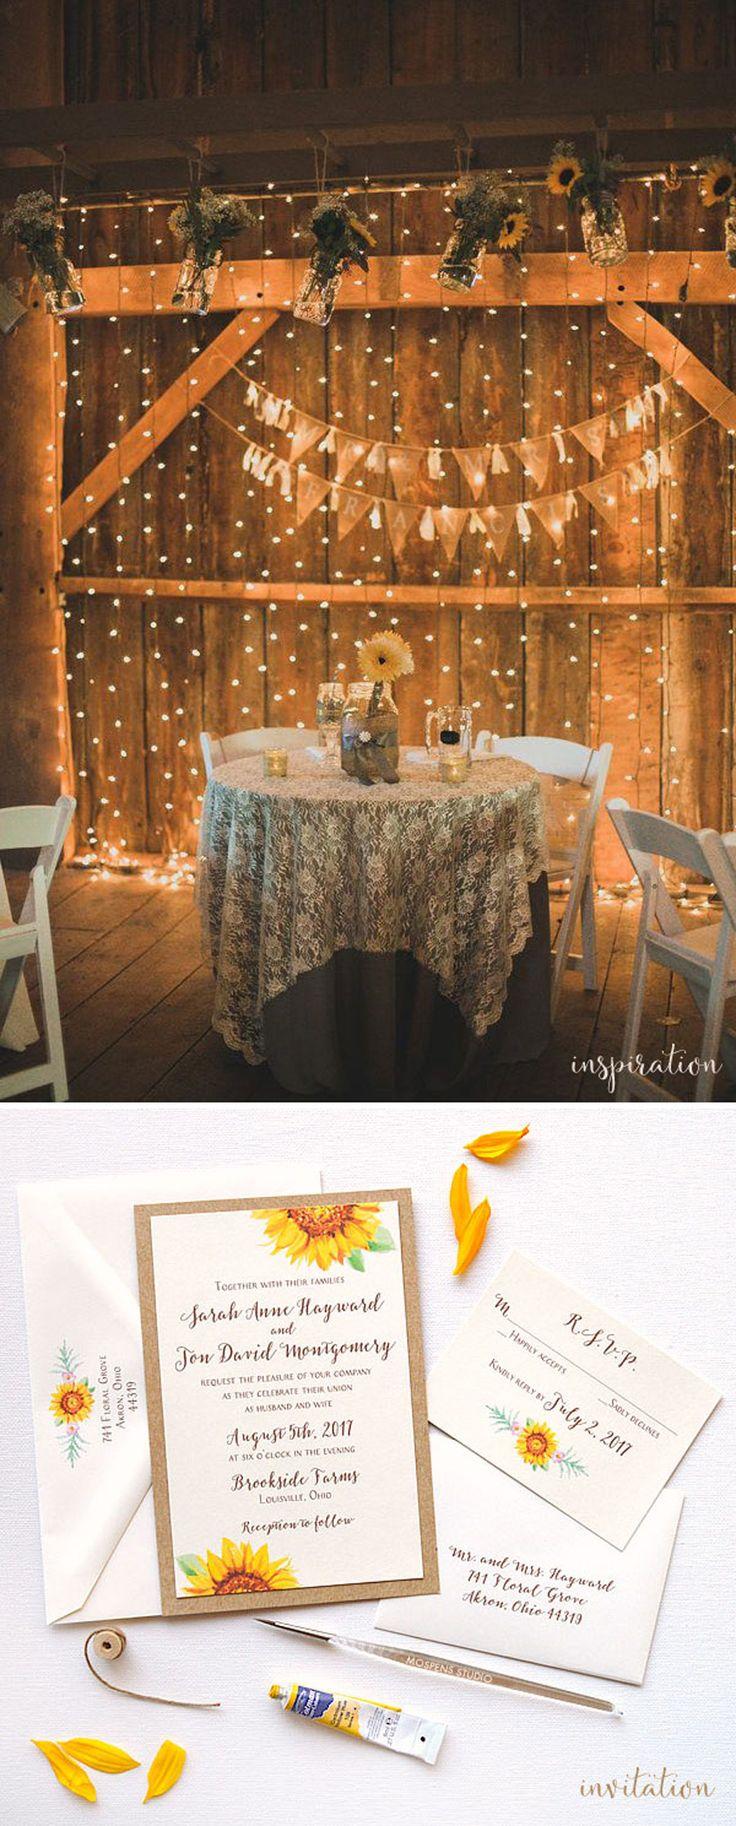 Wedding decorations red october 2018  best Wedding ideas images on Pinterest  Wedding ceremony